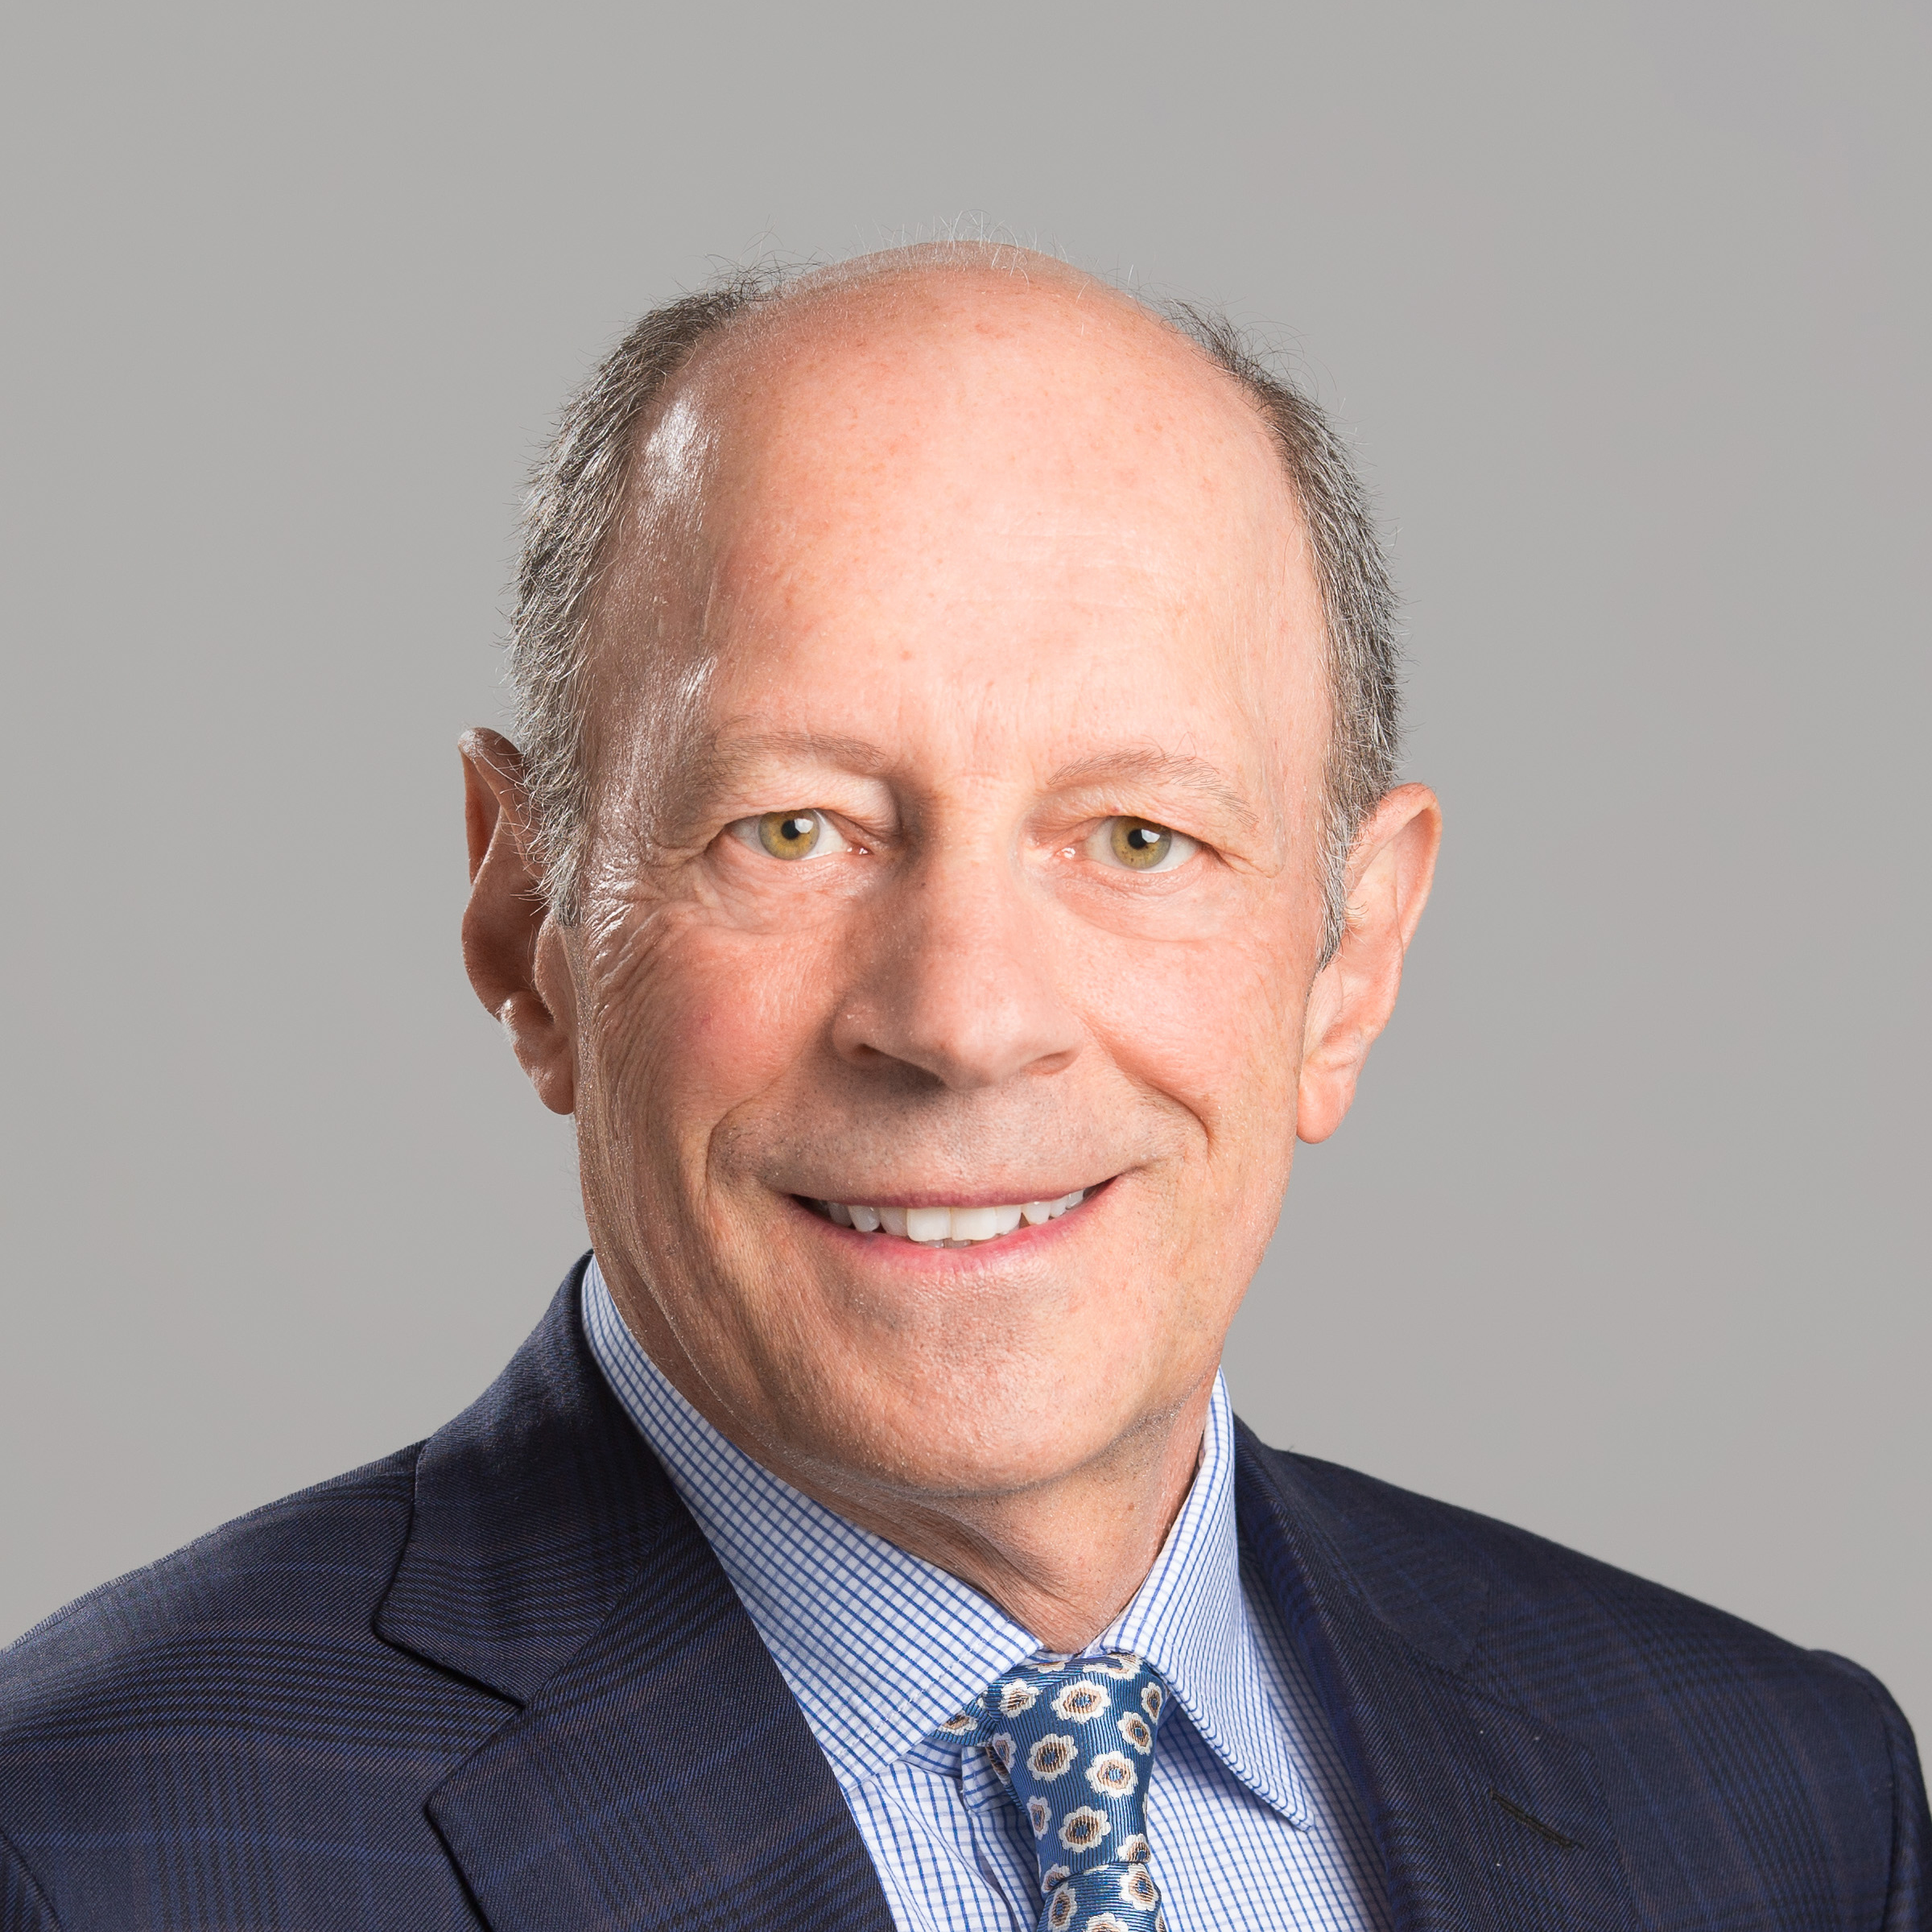 David Morrison, B.A., J.D.